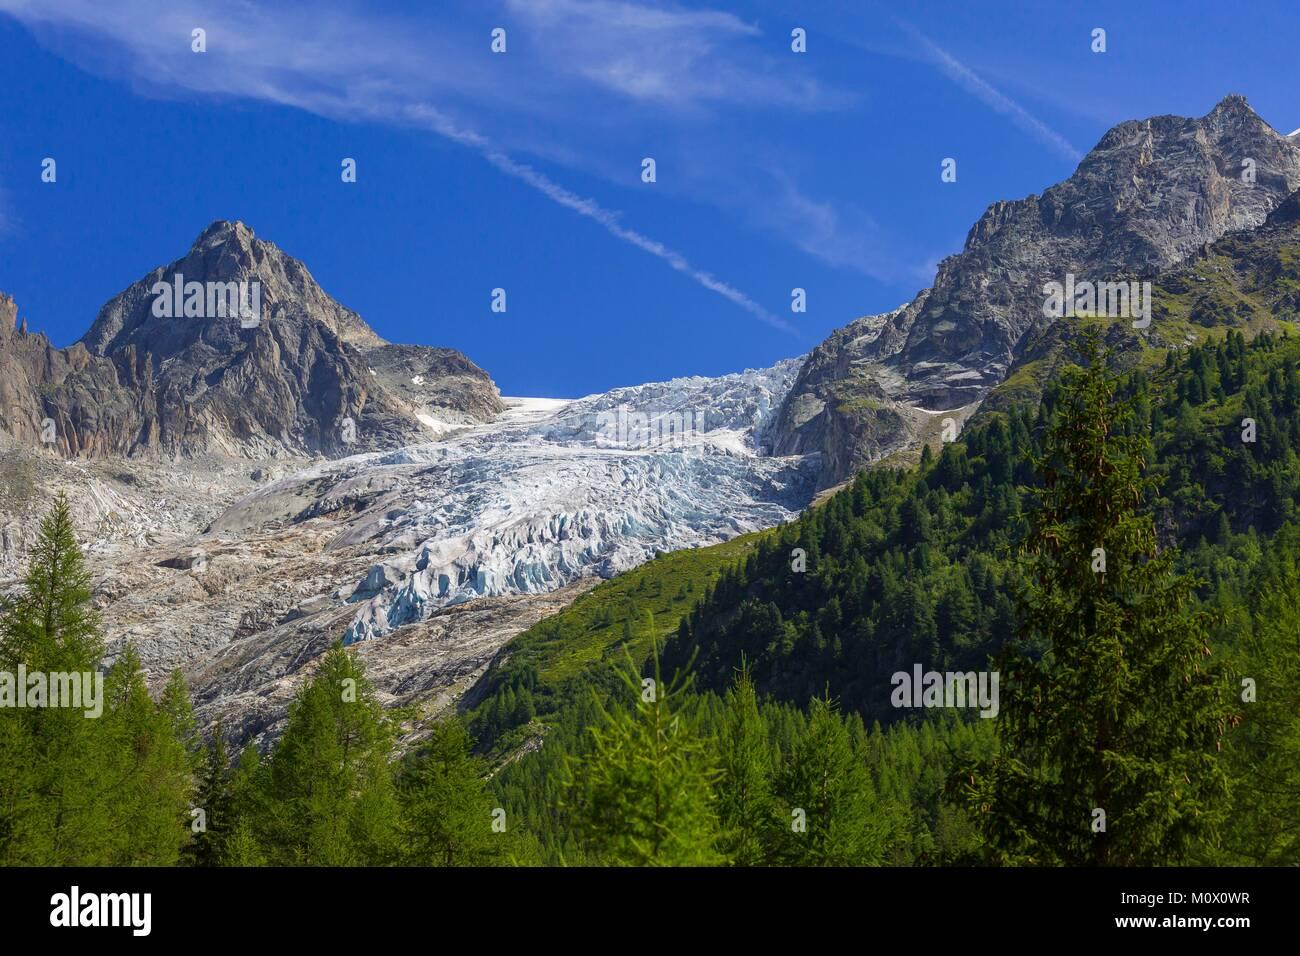 Switzerland,Valais,Trient,Trient glacier,Mont Blanc range - Stock Image